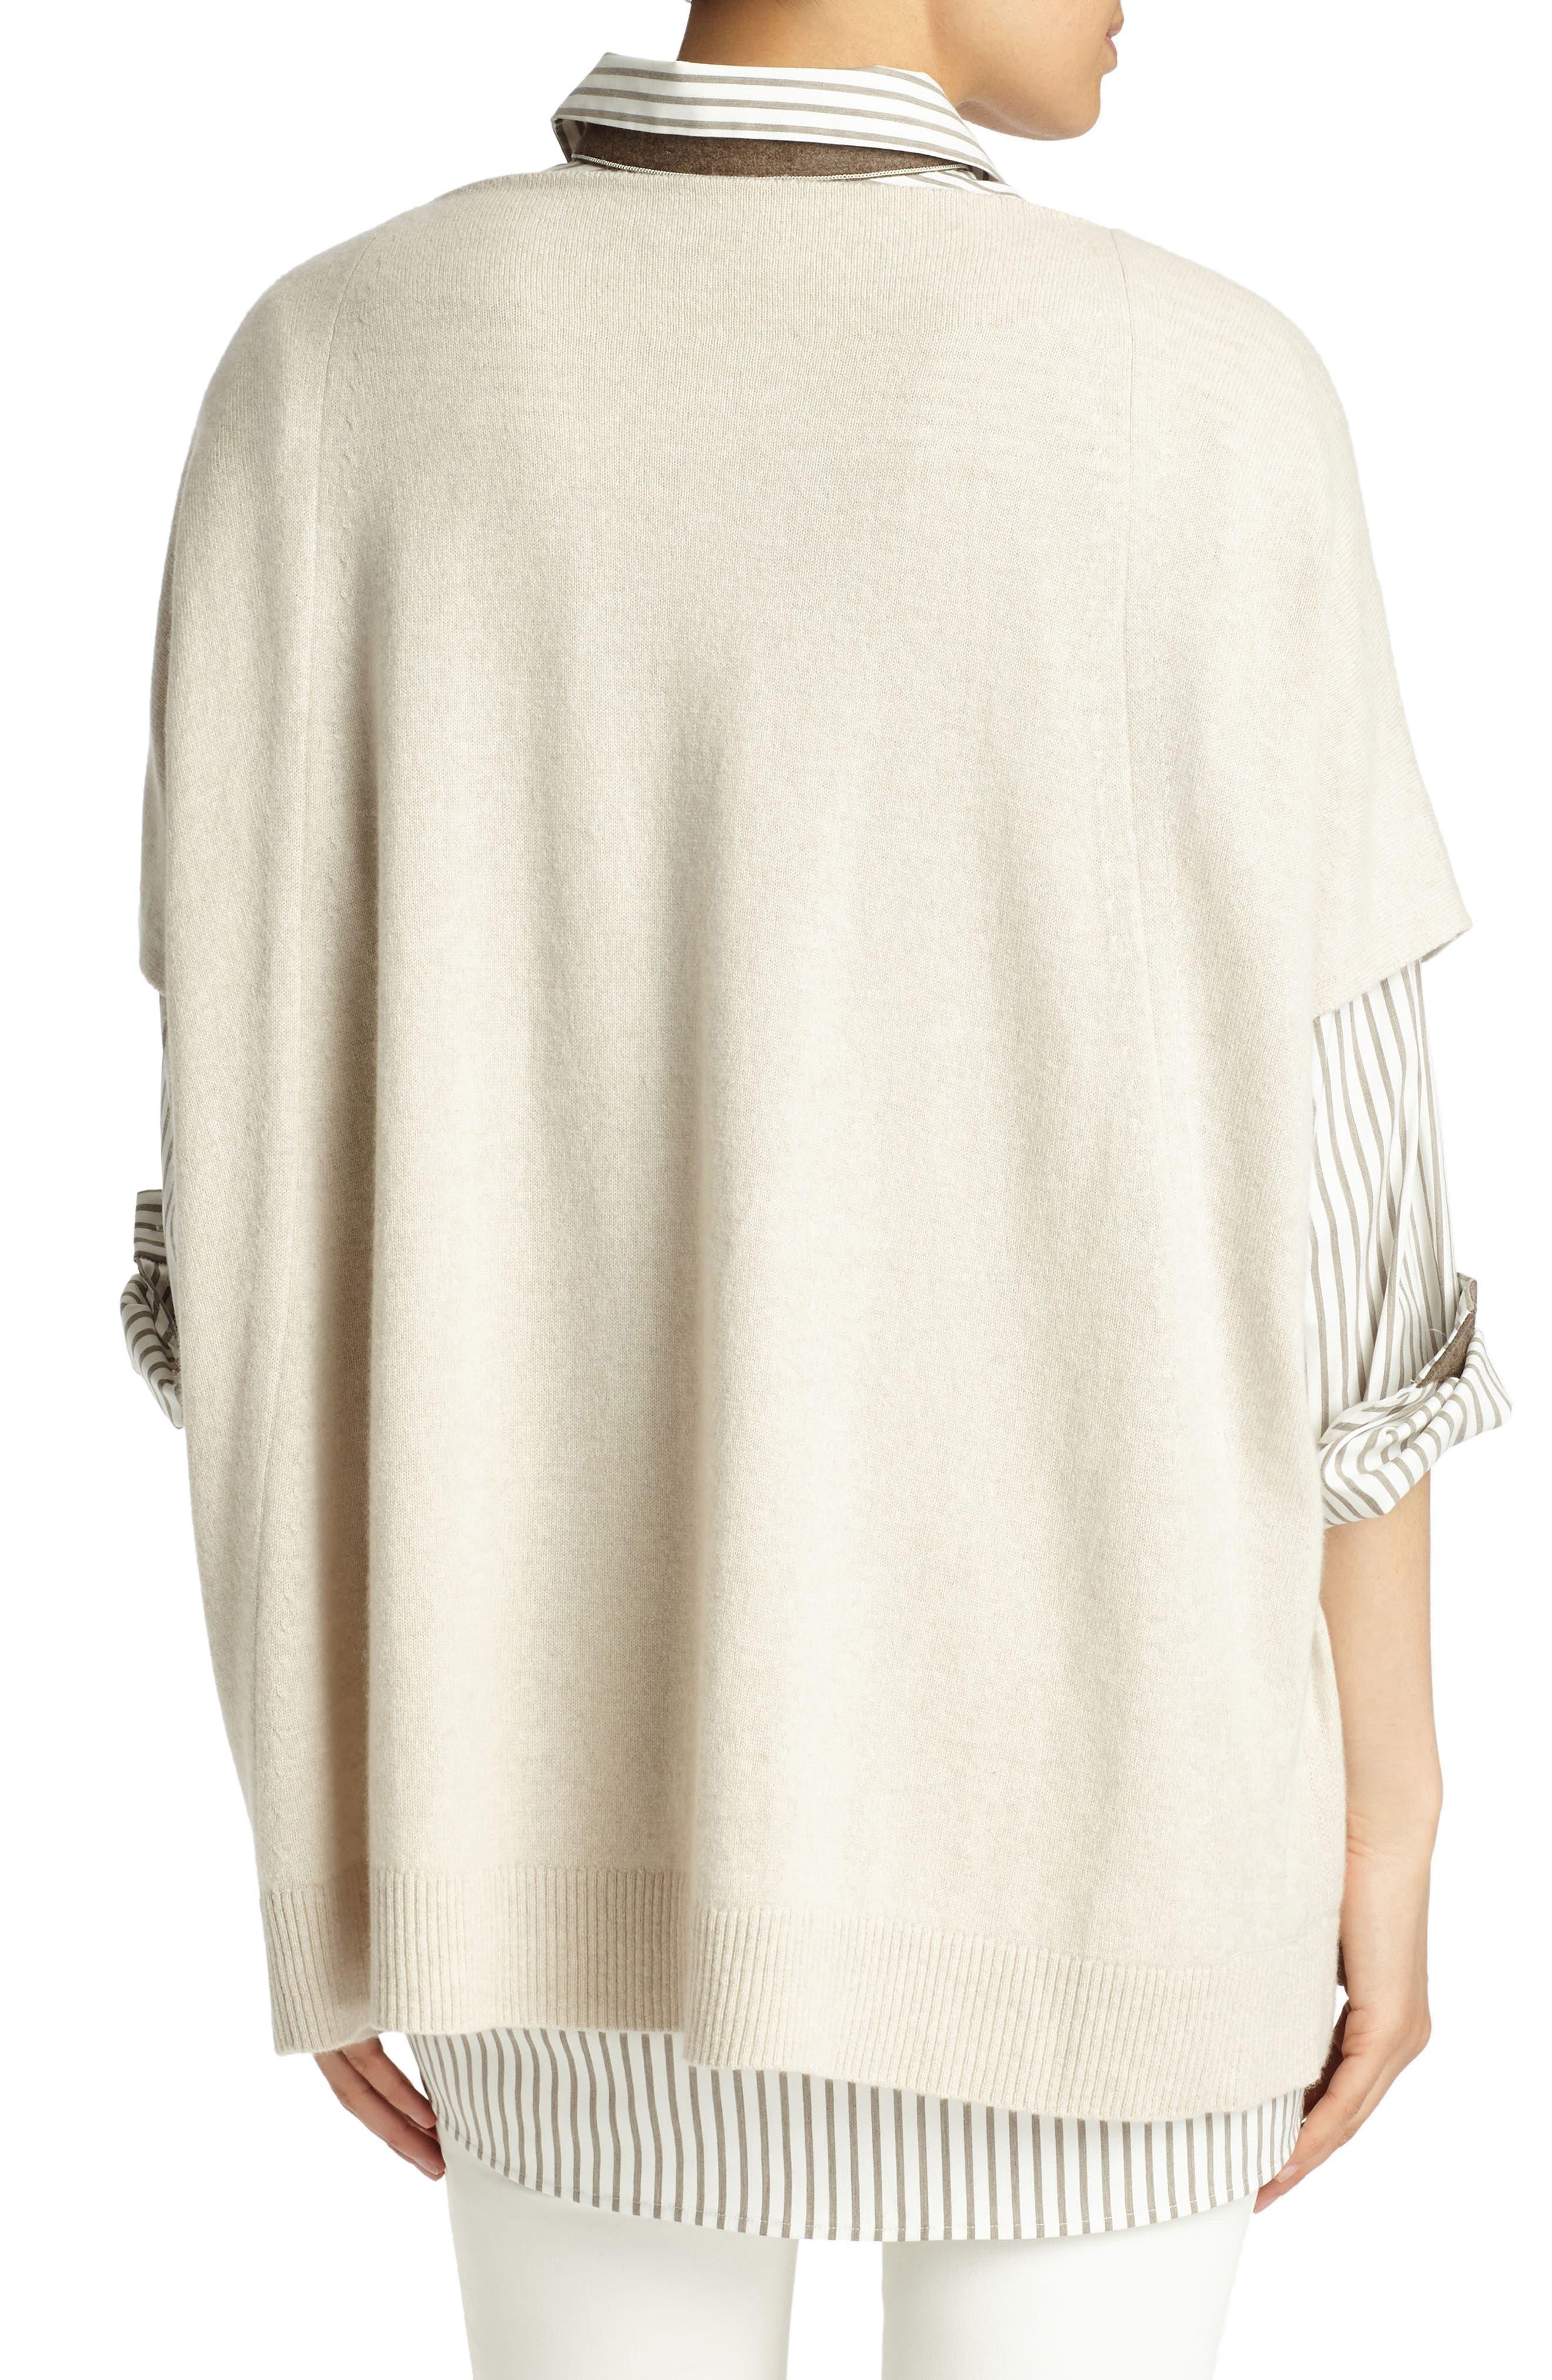 Cashmere Sweater,                             Alternate thumbnail 2, color,                             254